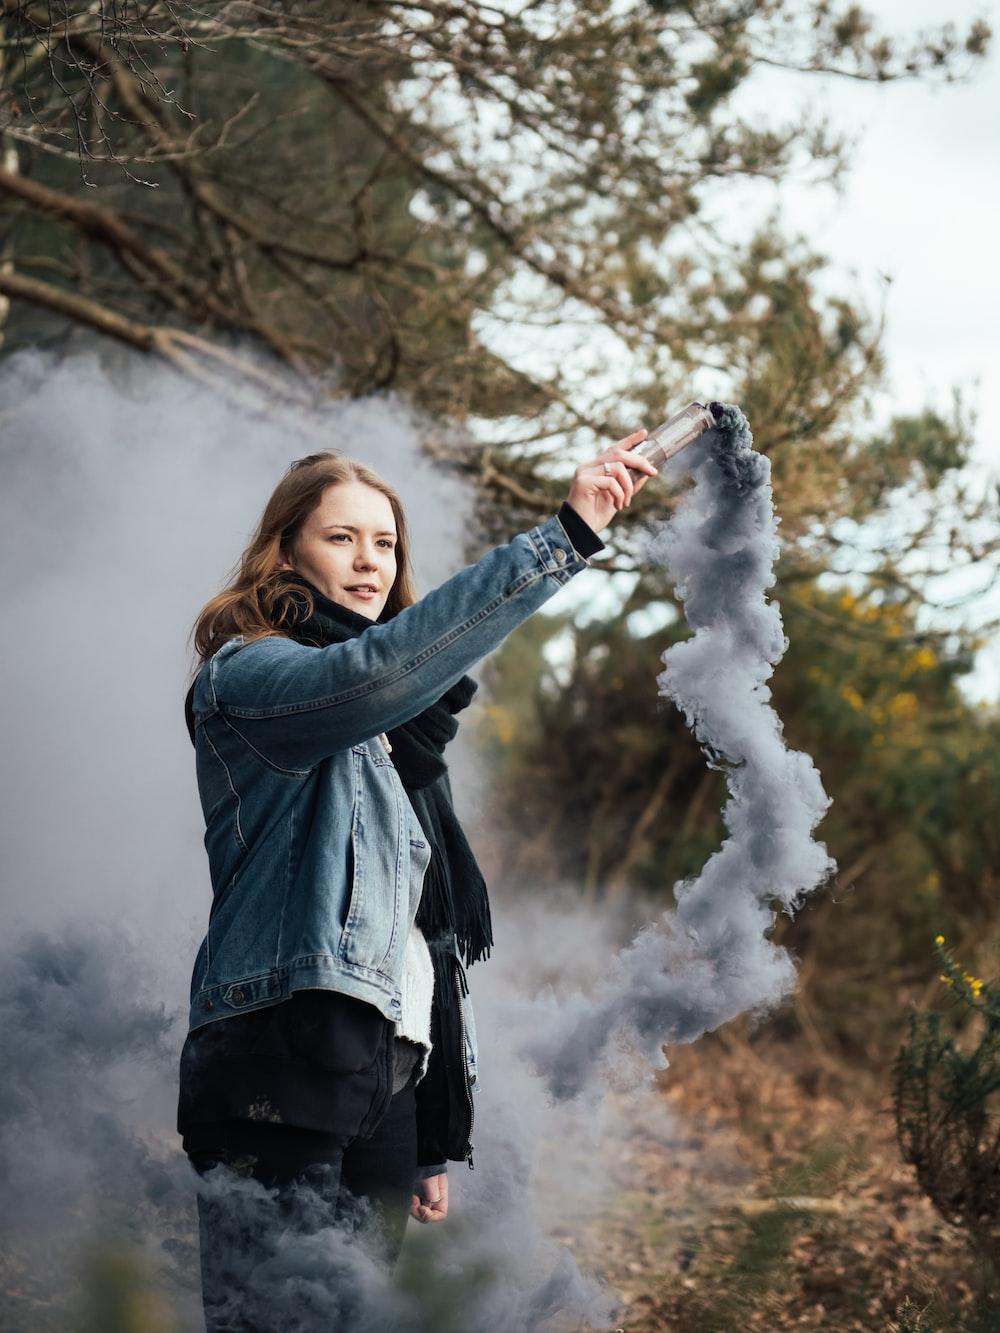 woman holding smoking device